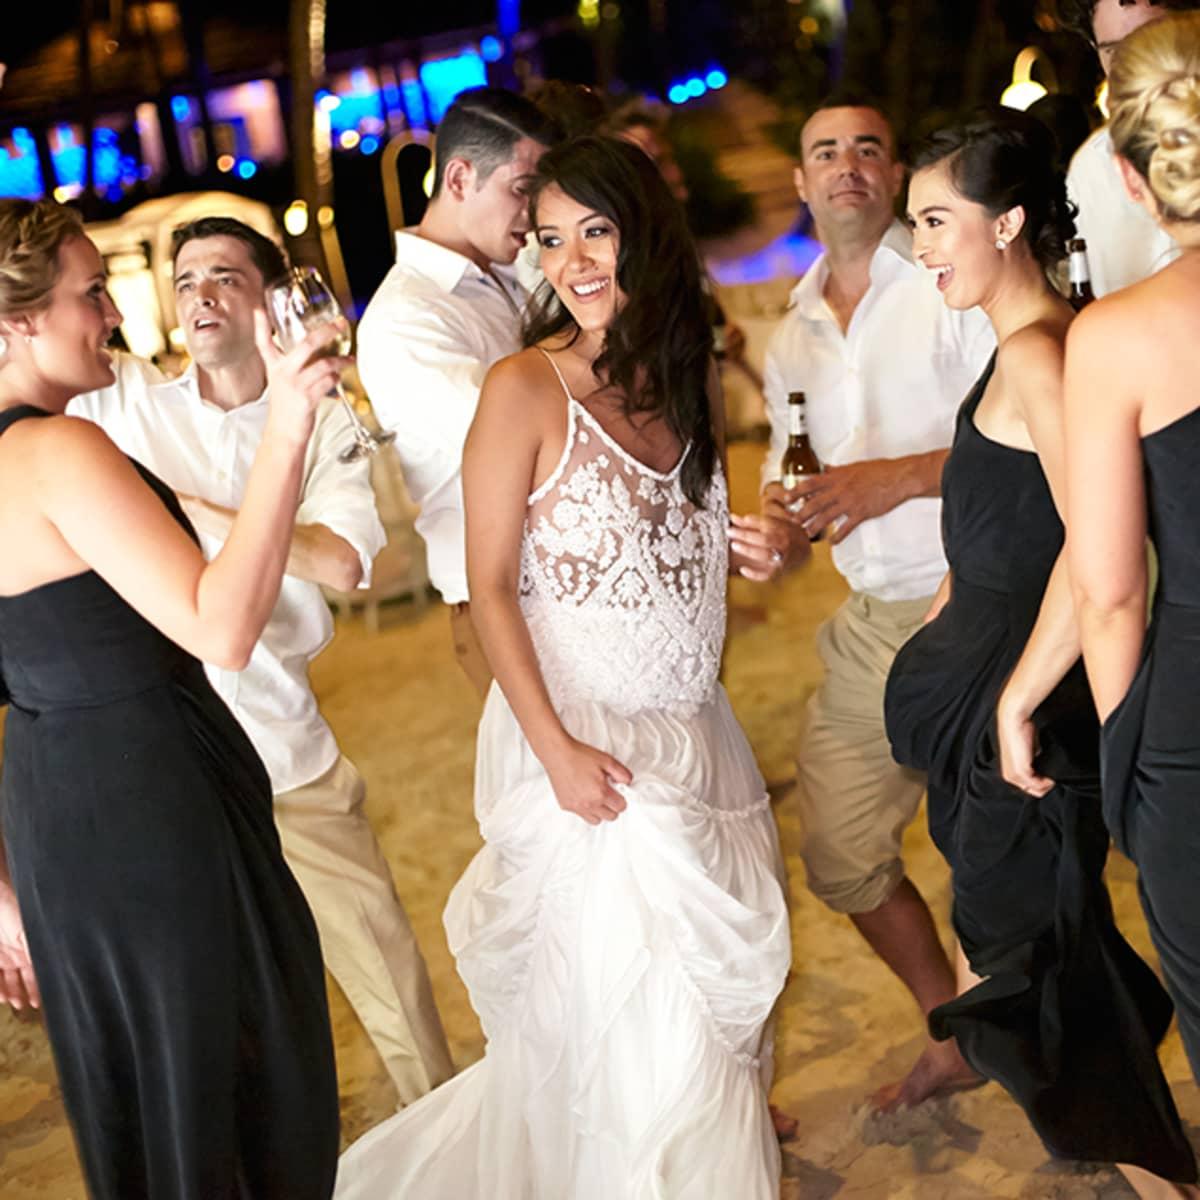 Koh Samui Destination Wedding | Four Seasons Resort Koh Samui